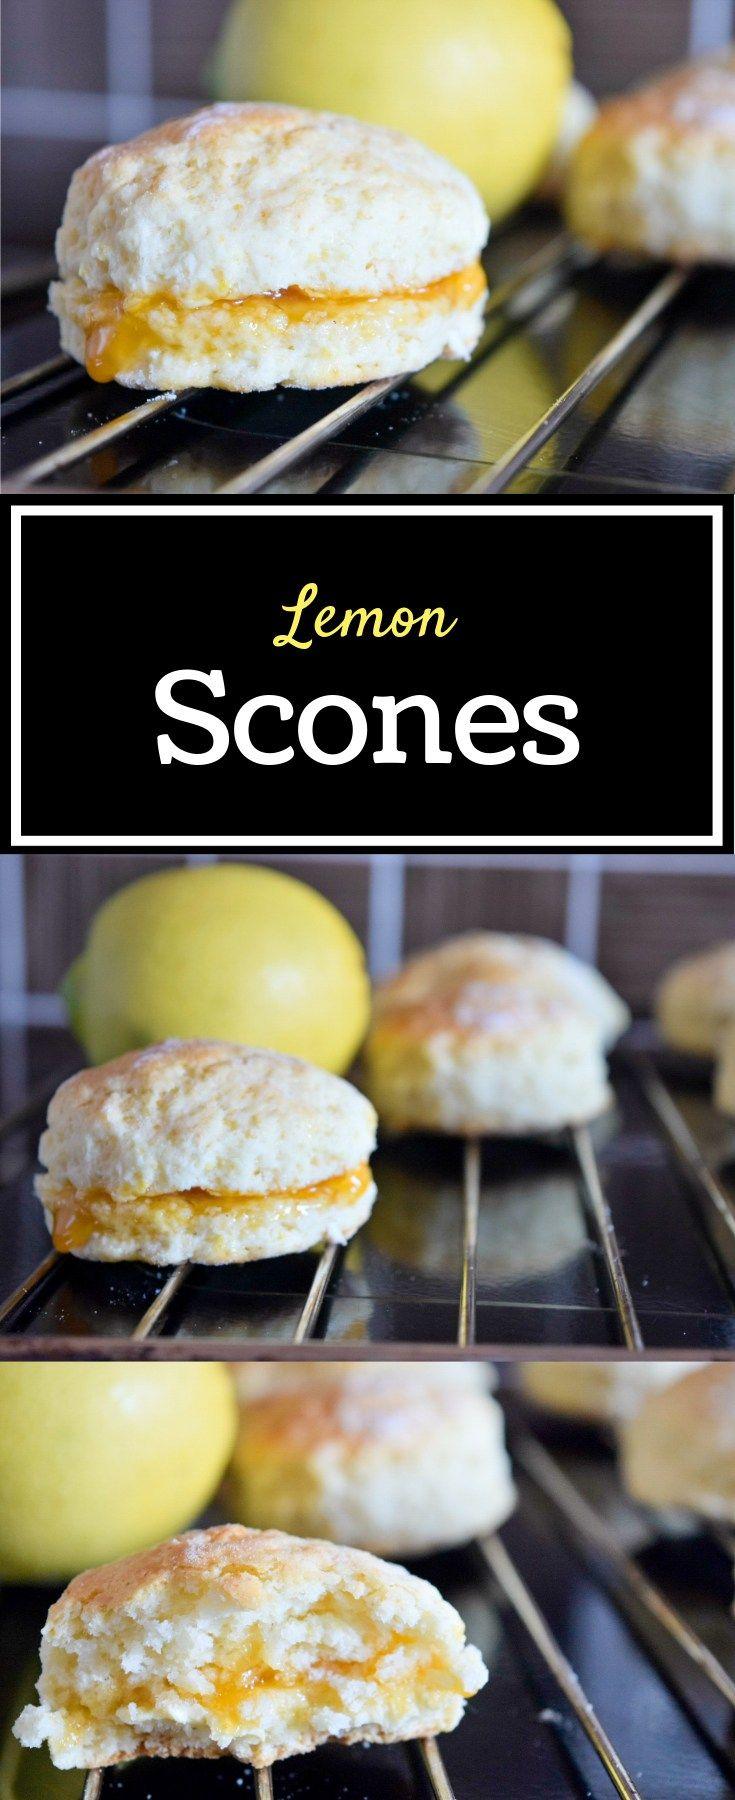 Lemon scones with apricot jam